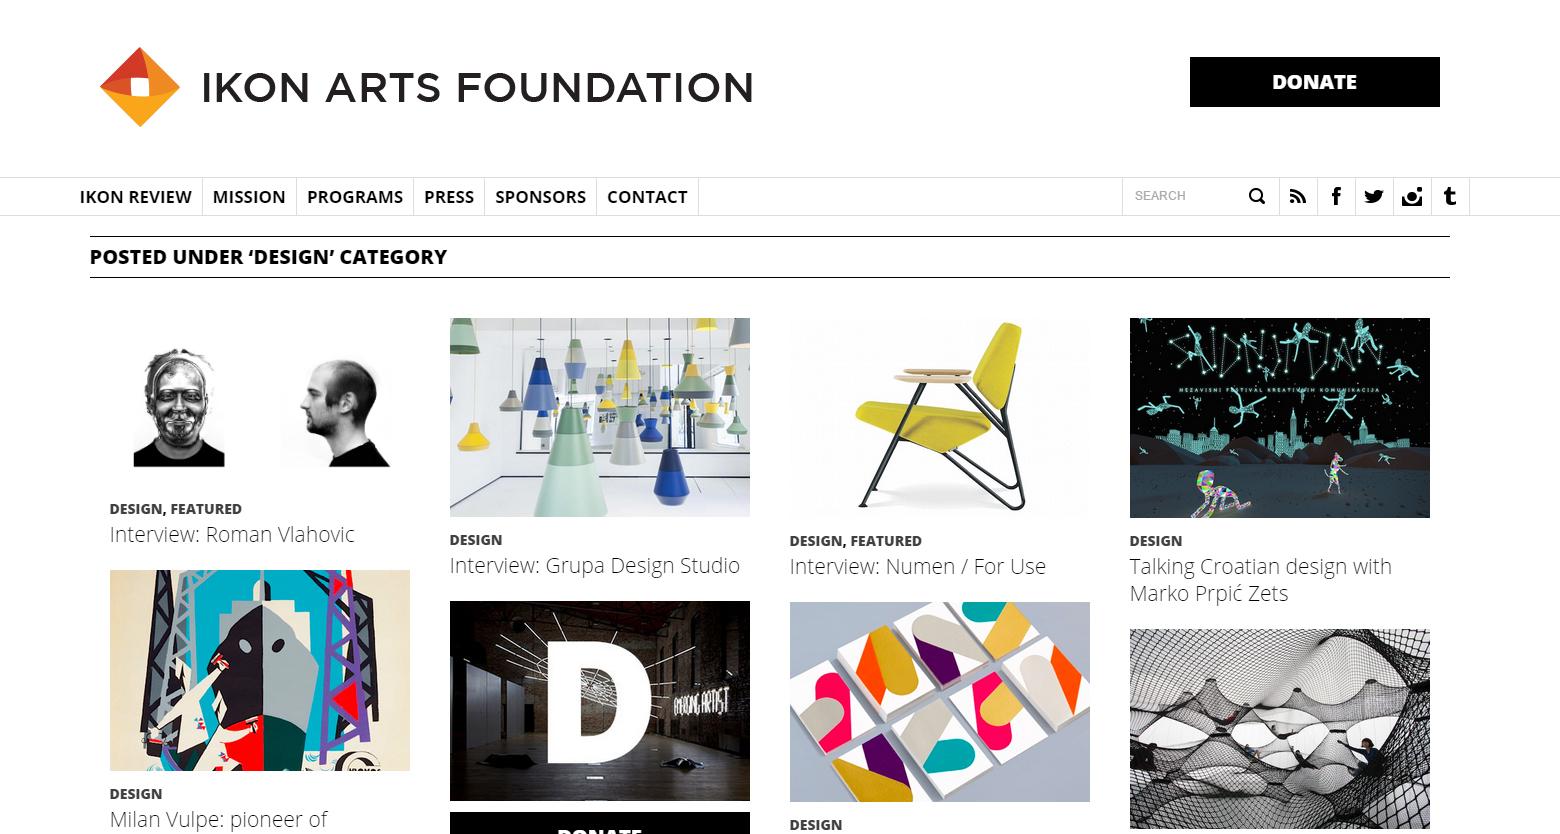 ikon art foundation inside